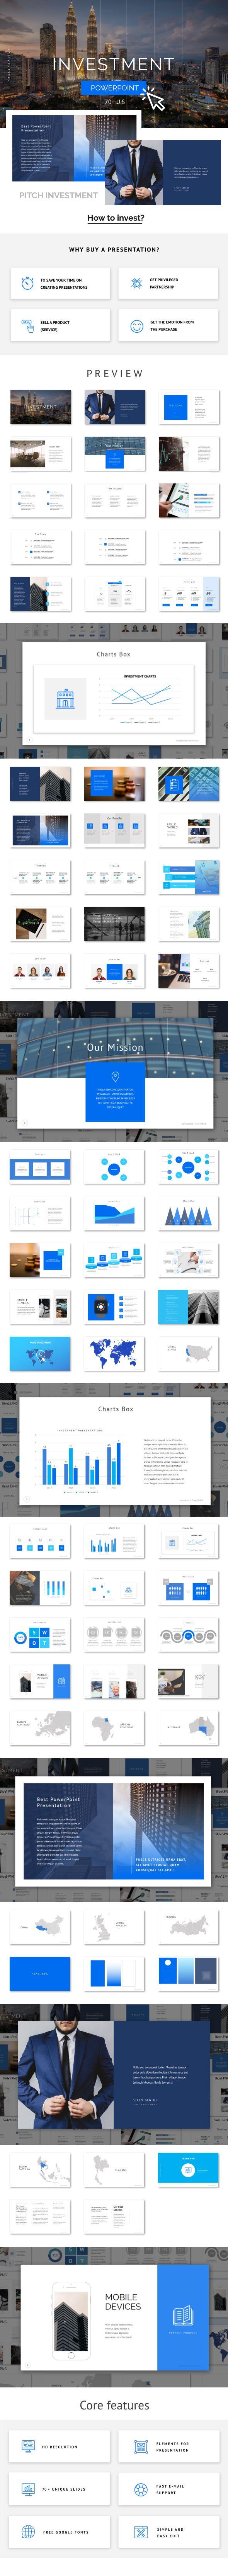 791 best powerpoint template images on pinterest power point investment powerpoint presentation powerpoint templates toneelgroepblik Choice Image